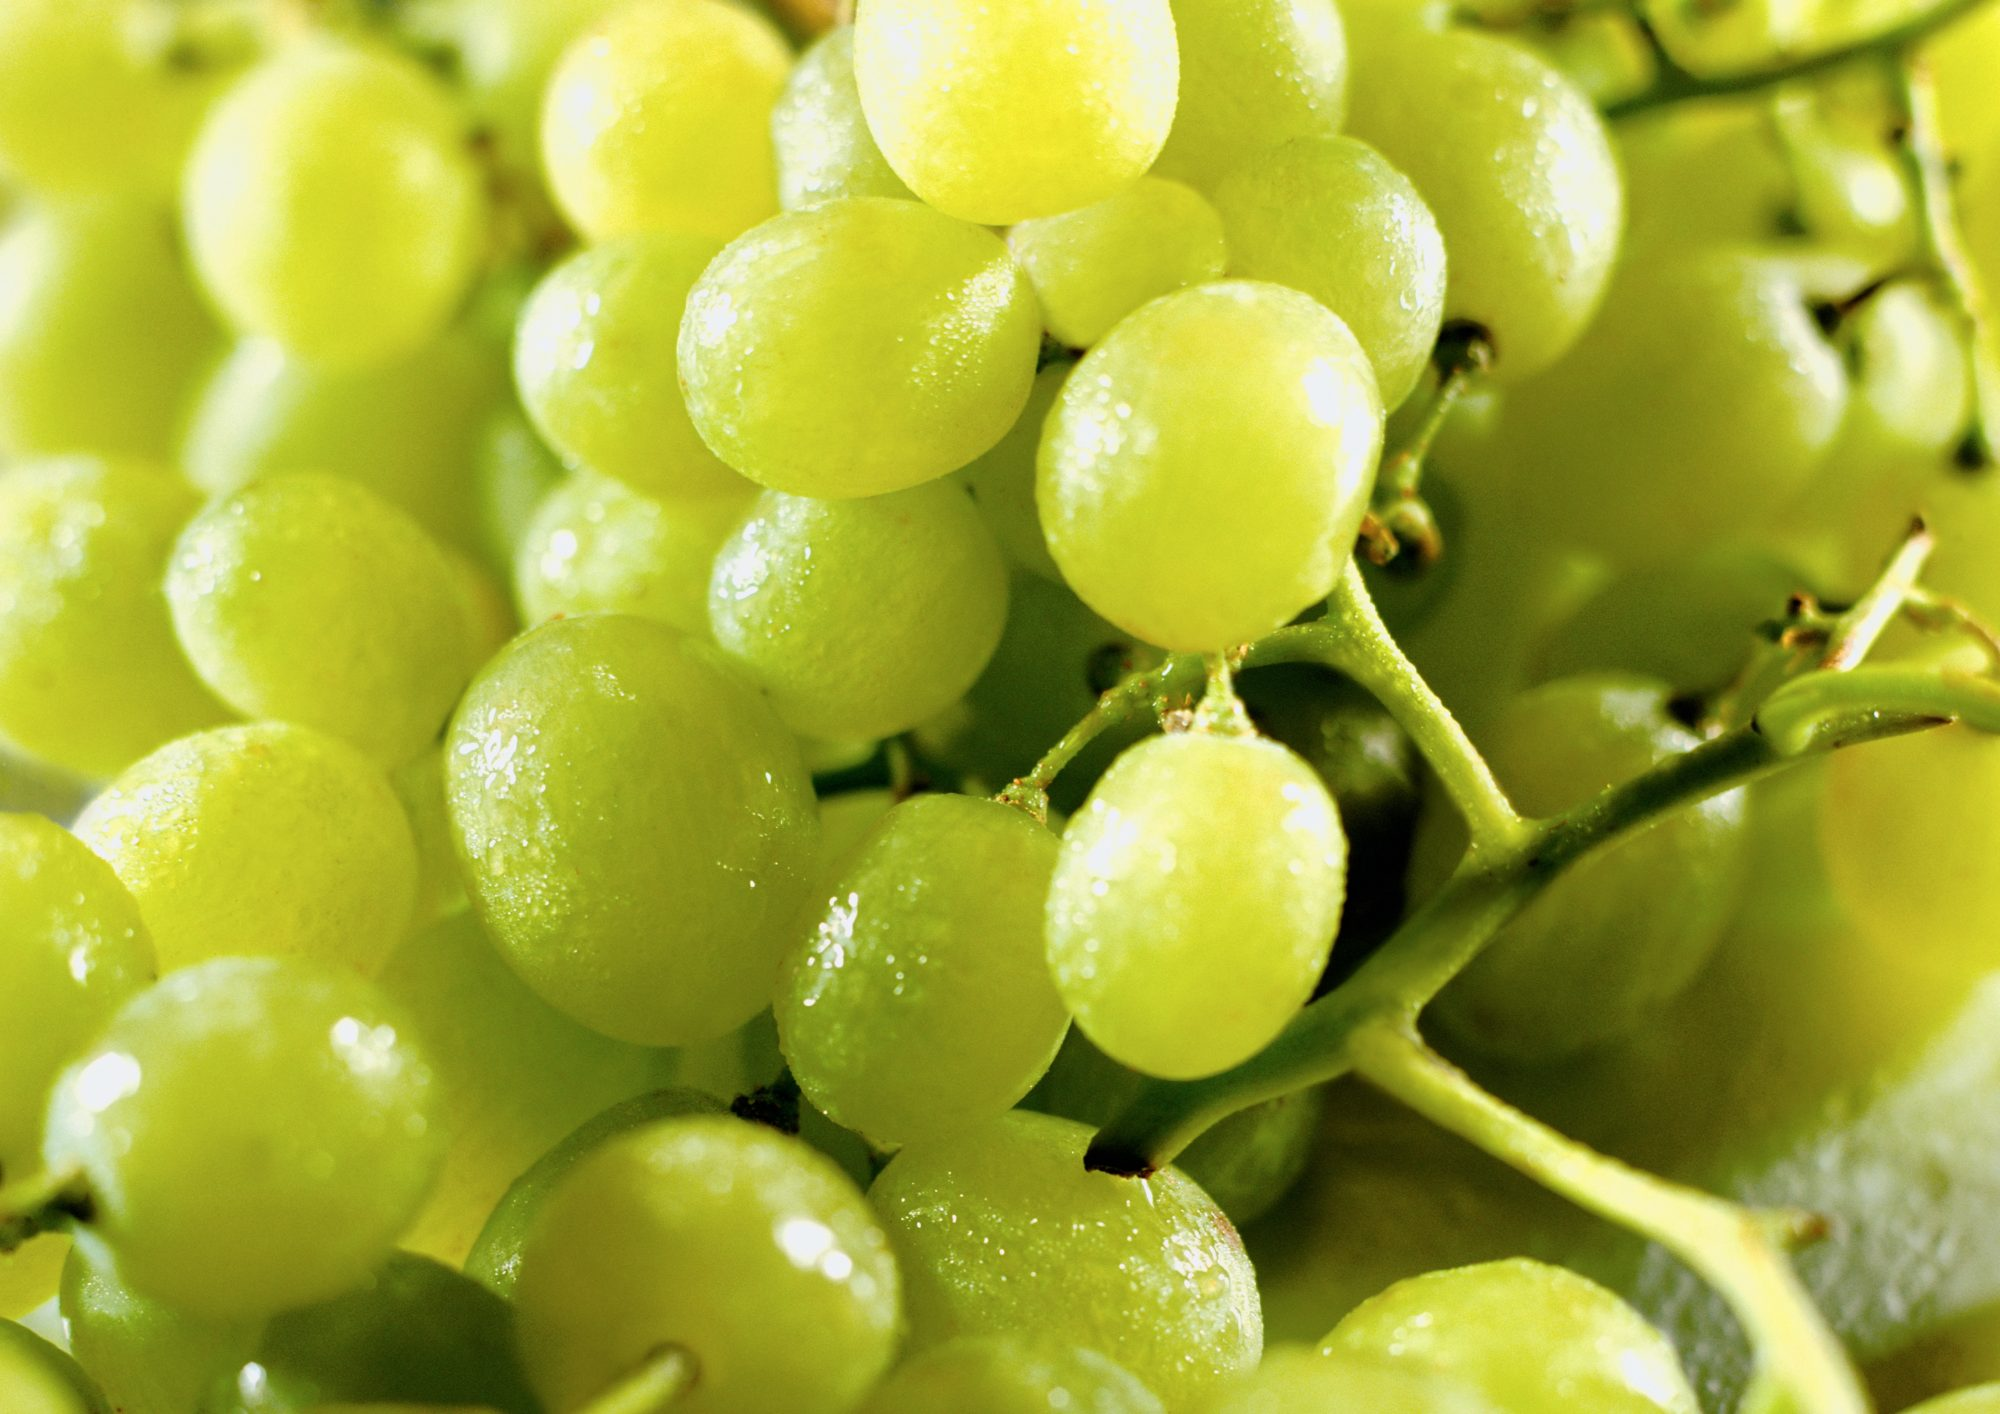 Fresh grapes Getty 8/25/20